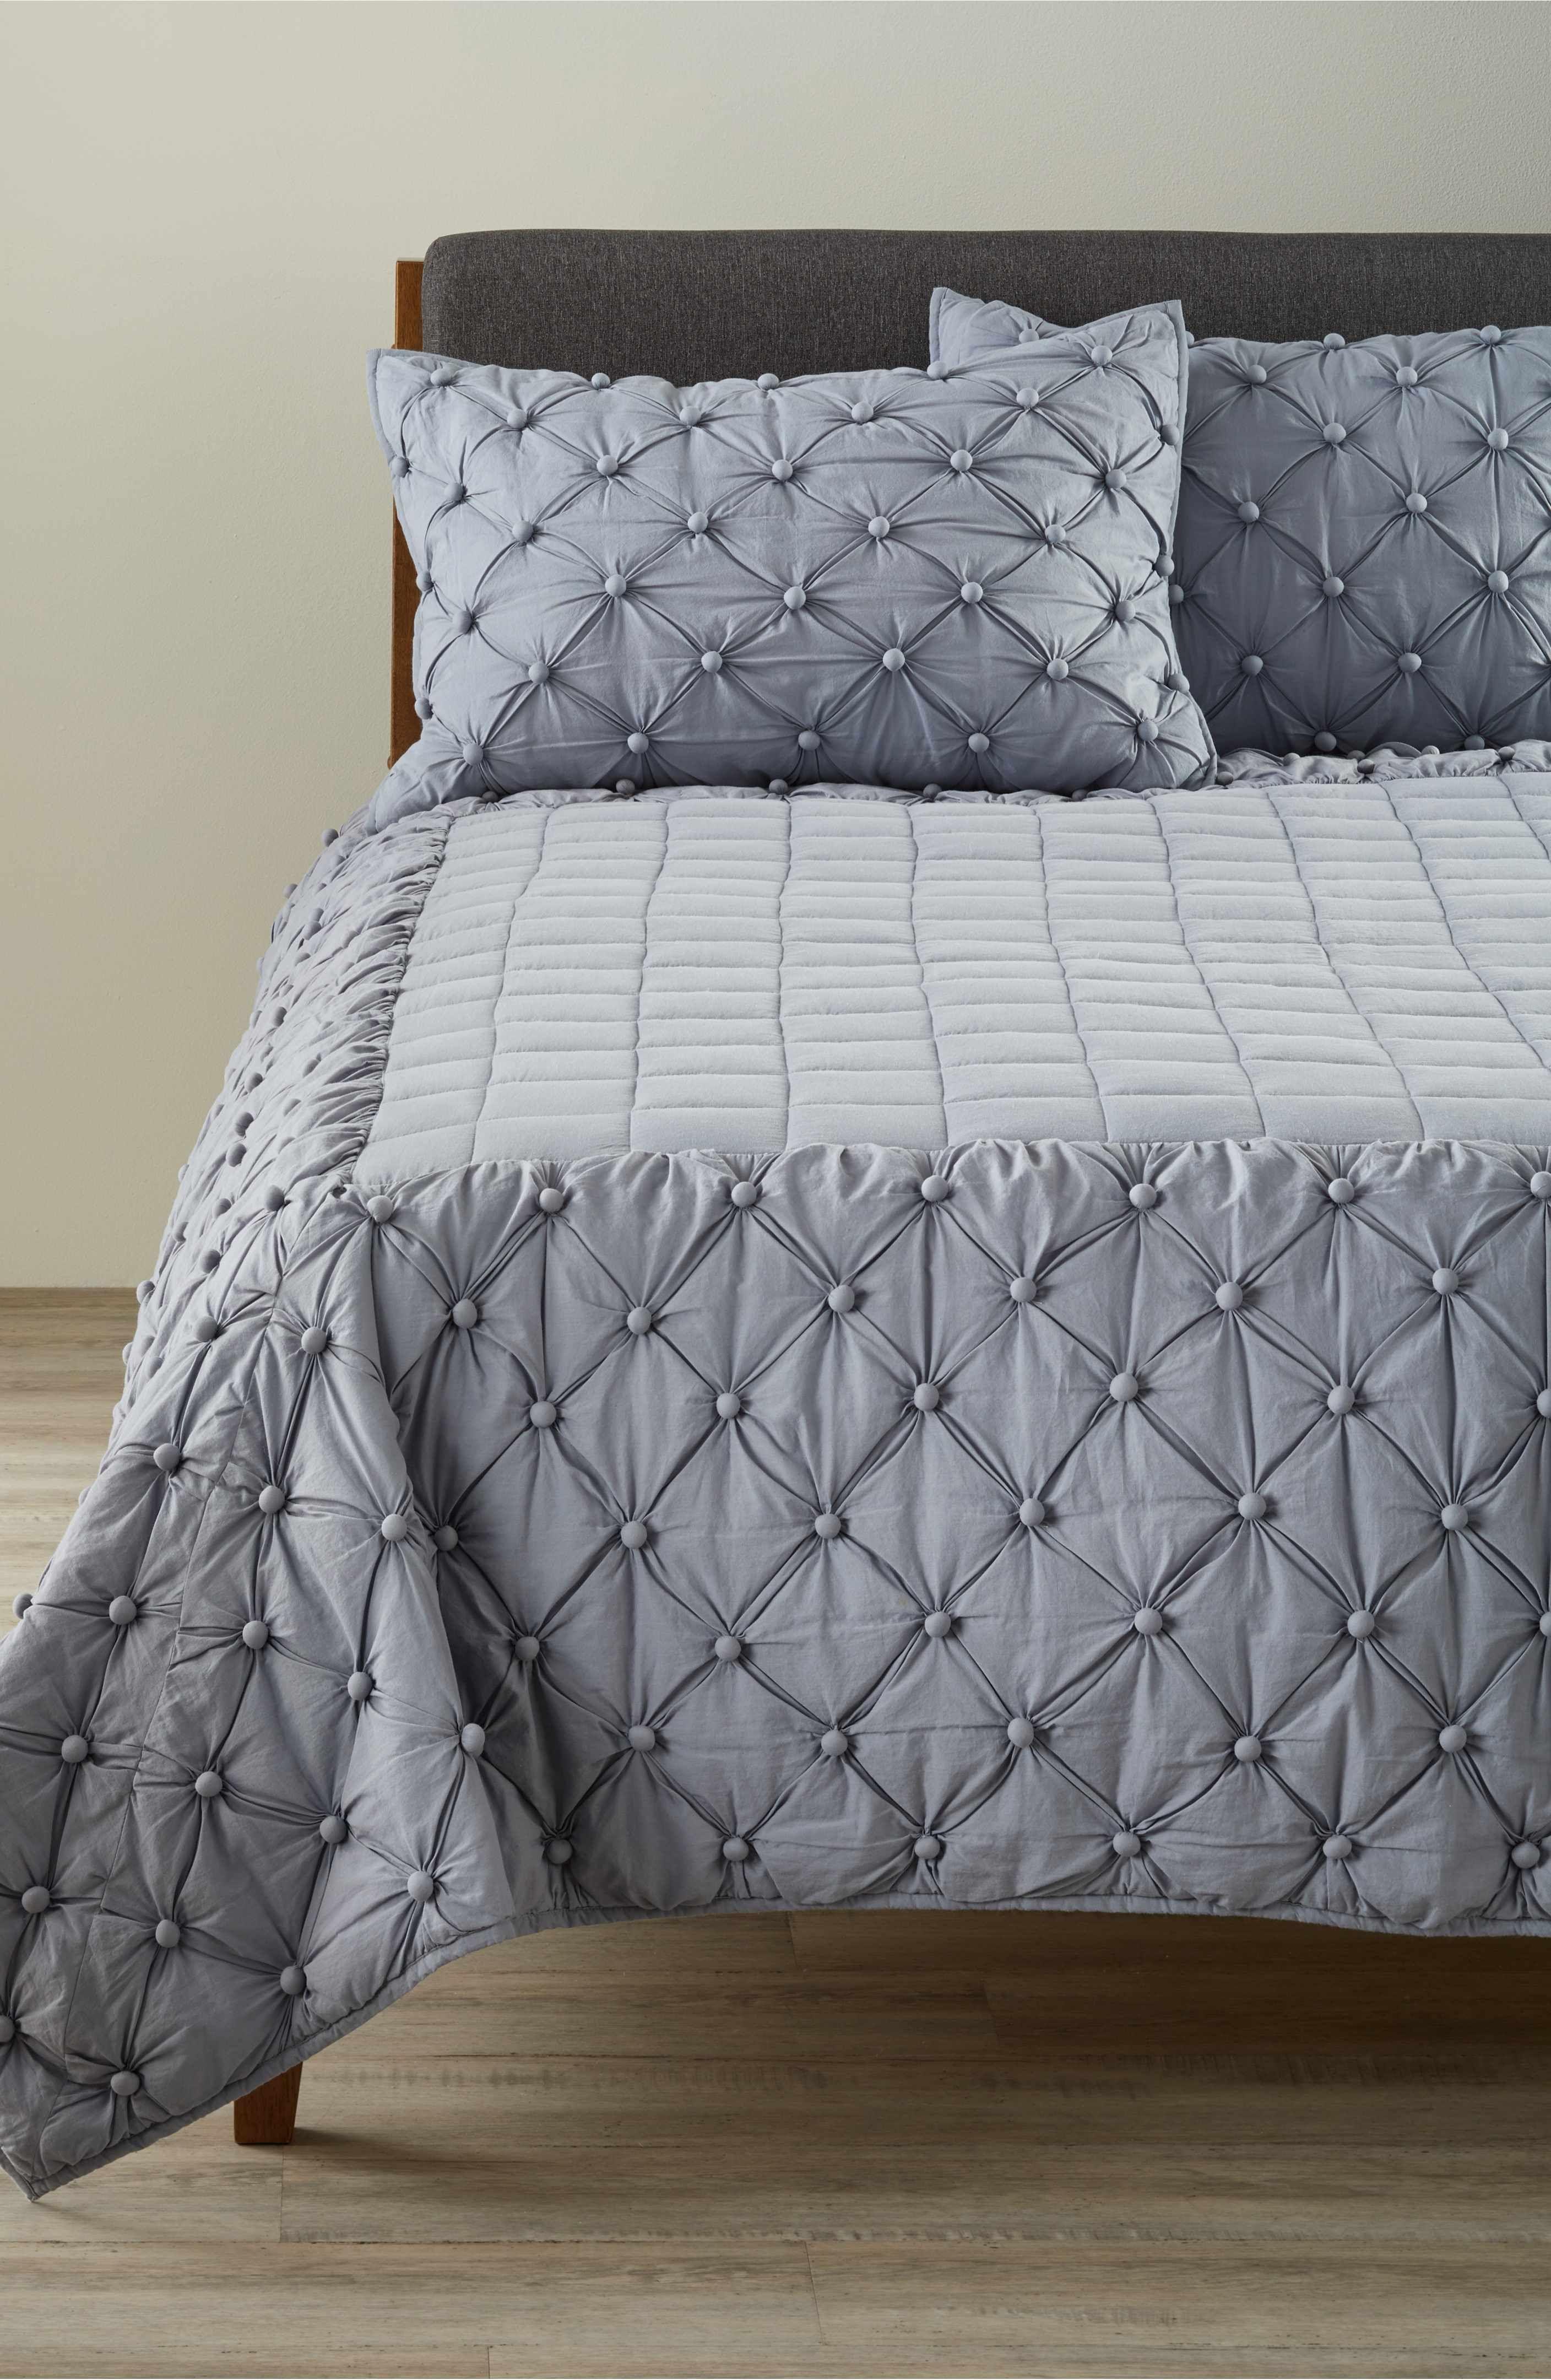 Nordstrom At Home Chelsea Comforter Comforters Comforter Sets